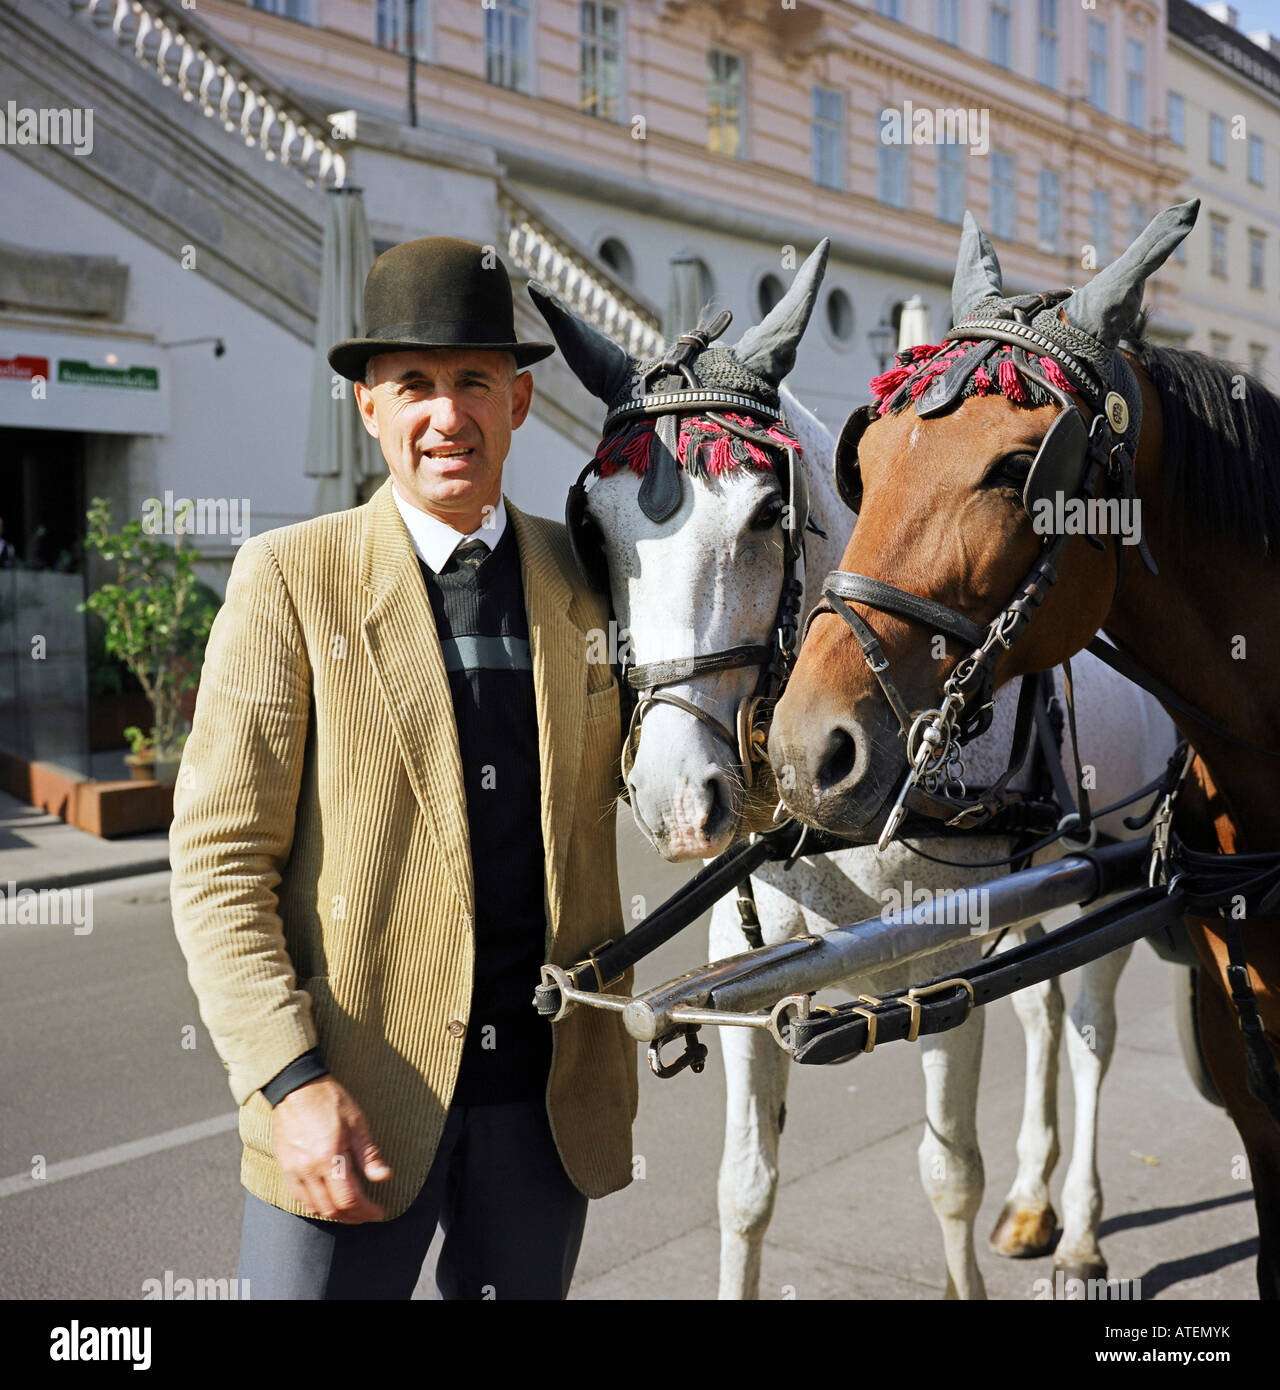 Coachman and his horses, Vienna, Austria - Stock Image